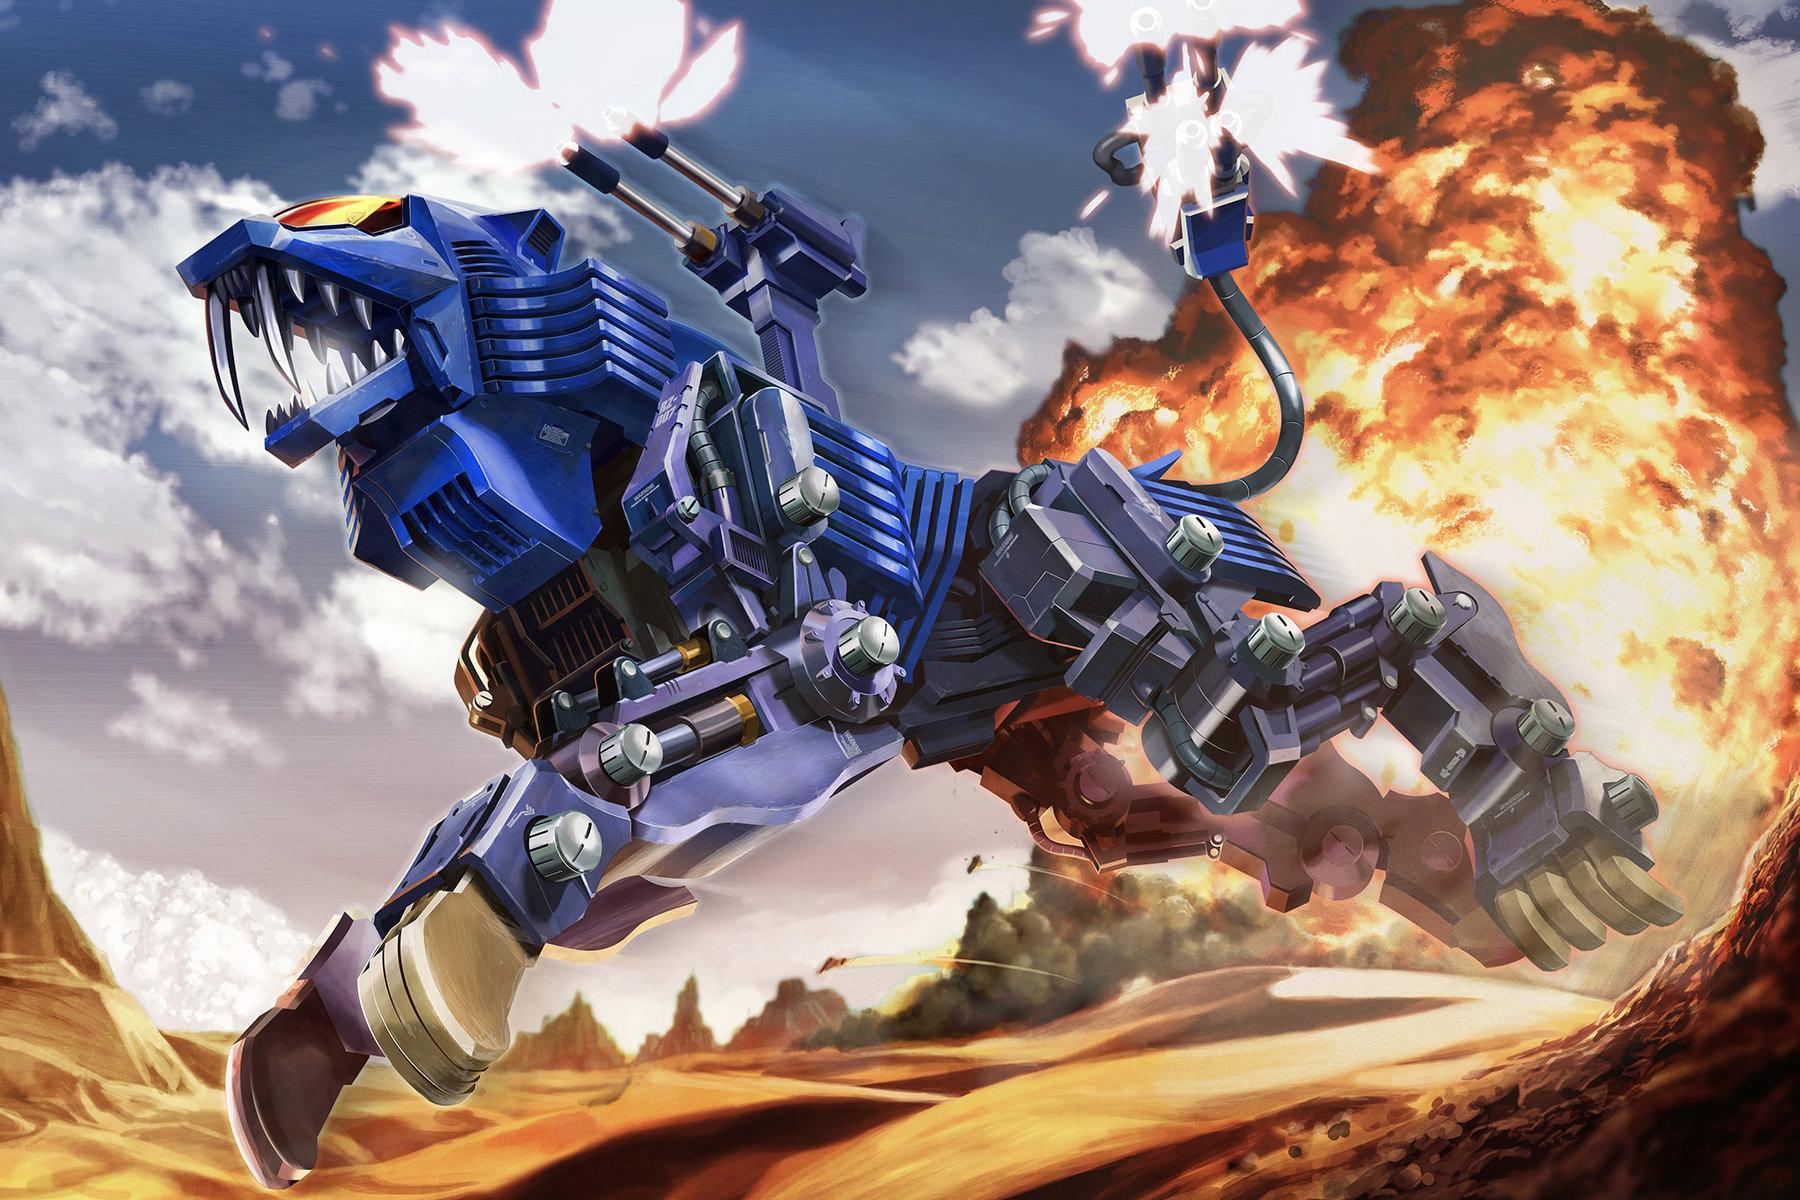 ZOIDS shield liger